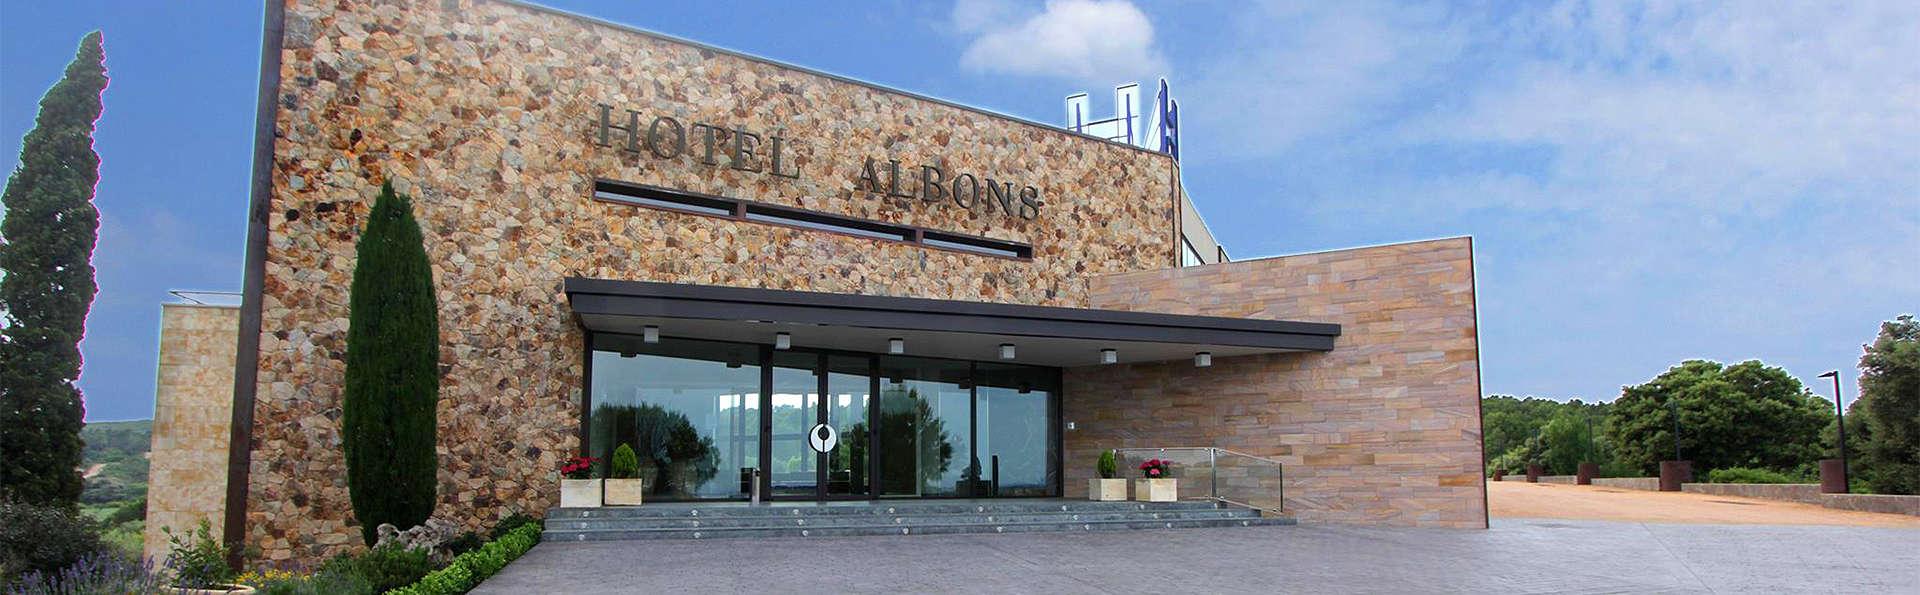 Hotel Albons - EDIT_Exterior.jpg